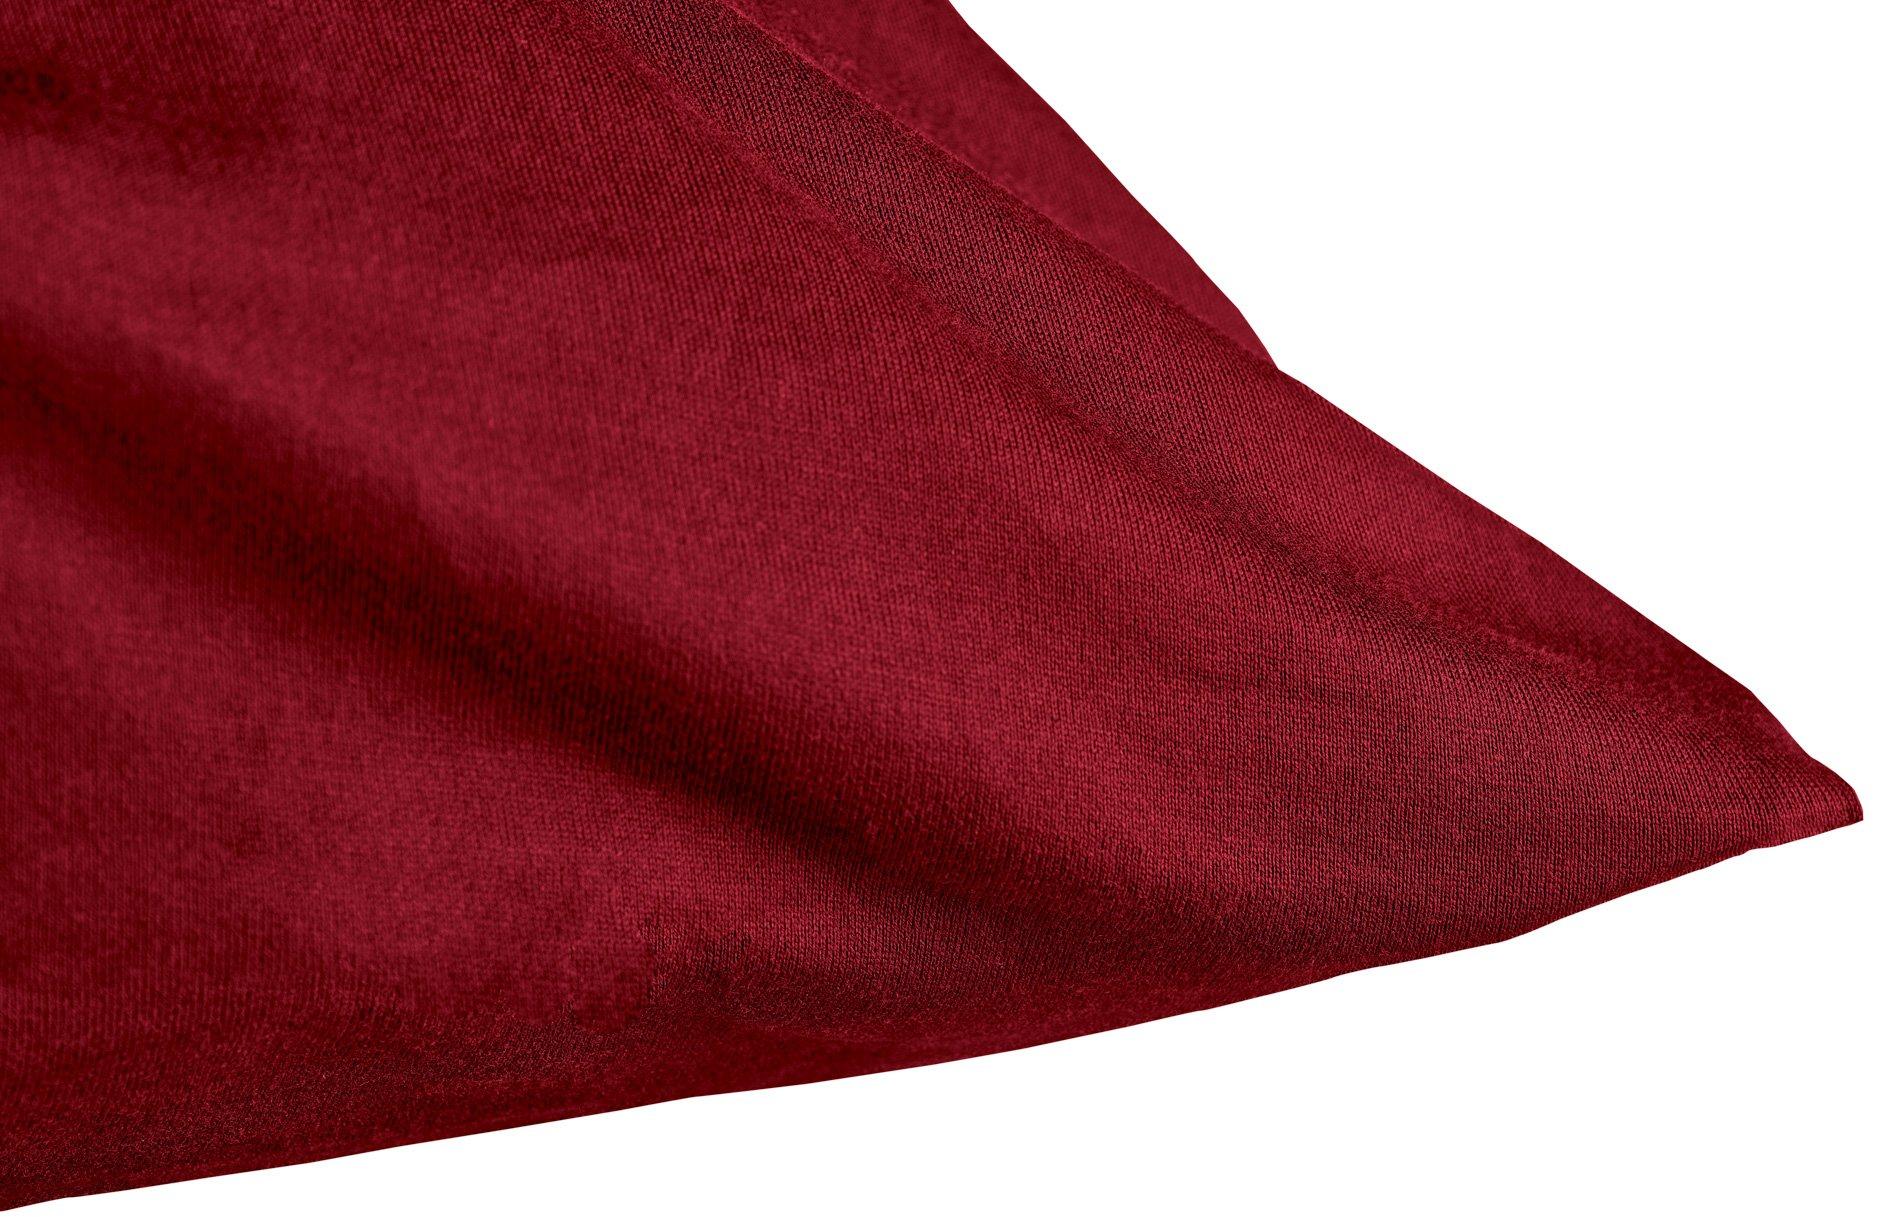 Edel-Zwirn-Jersey karmin B40cm